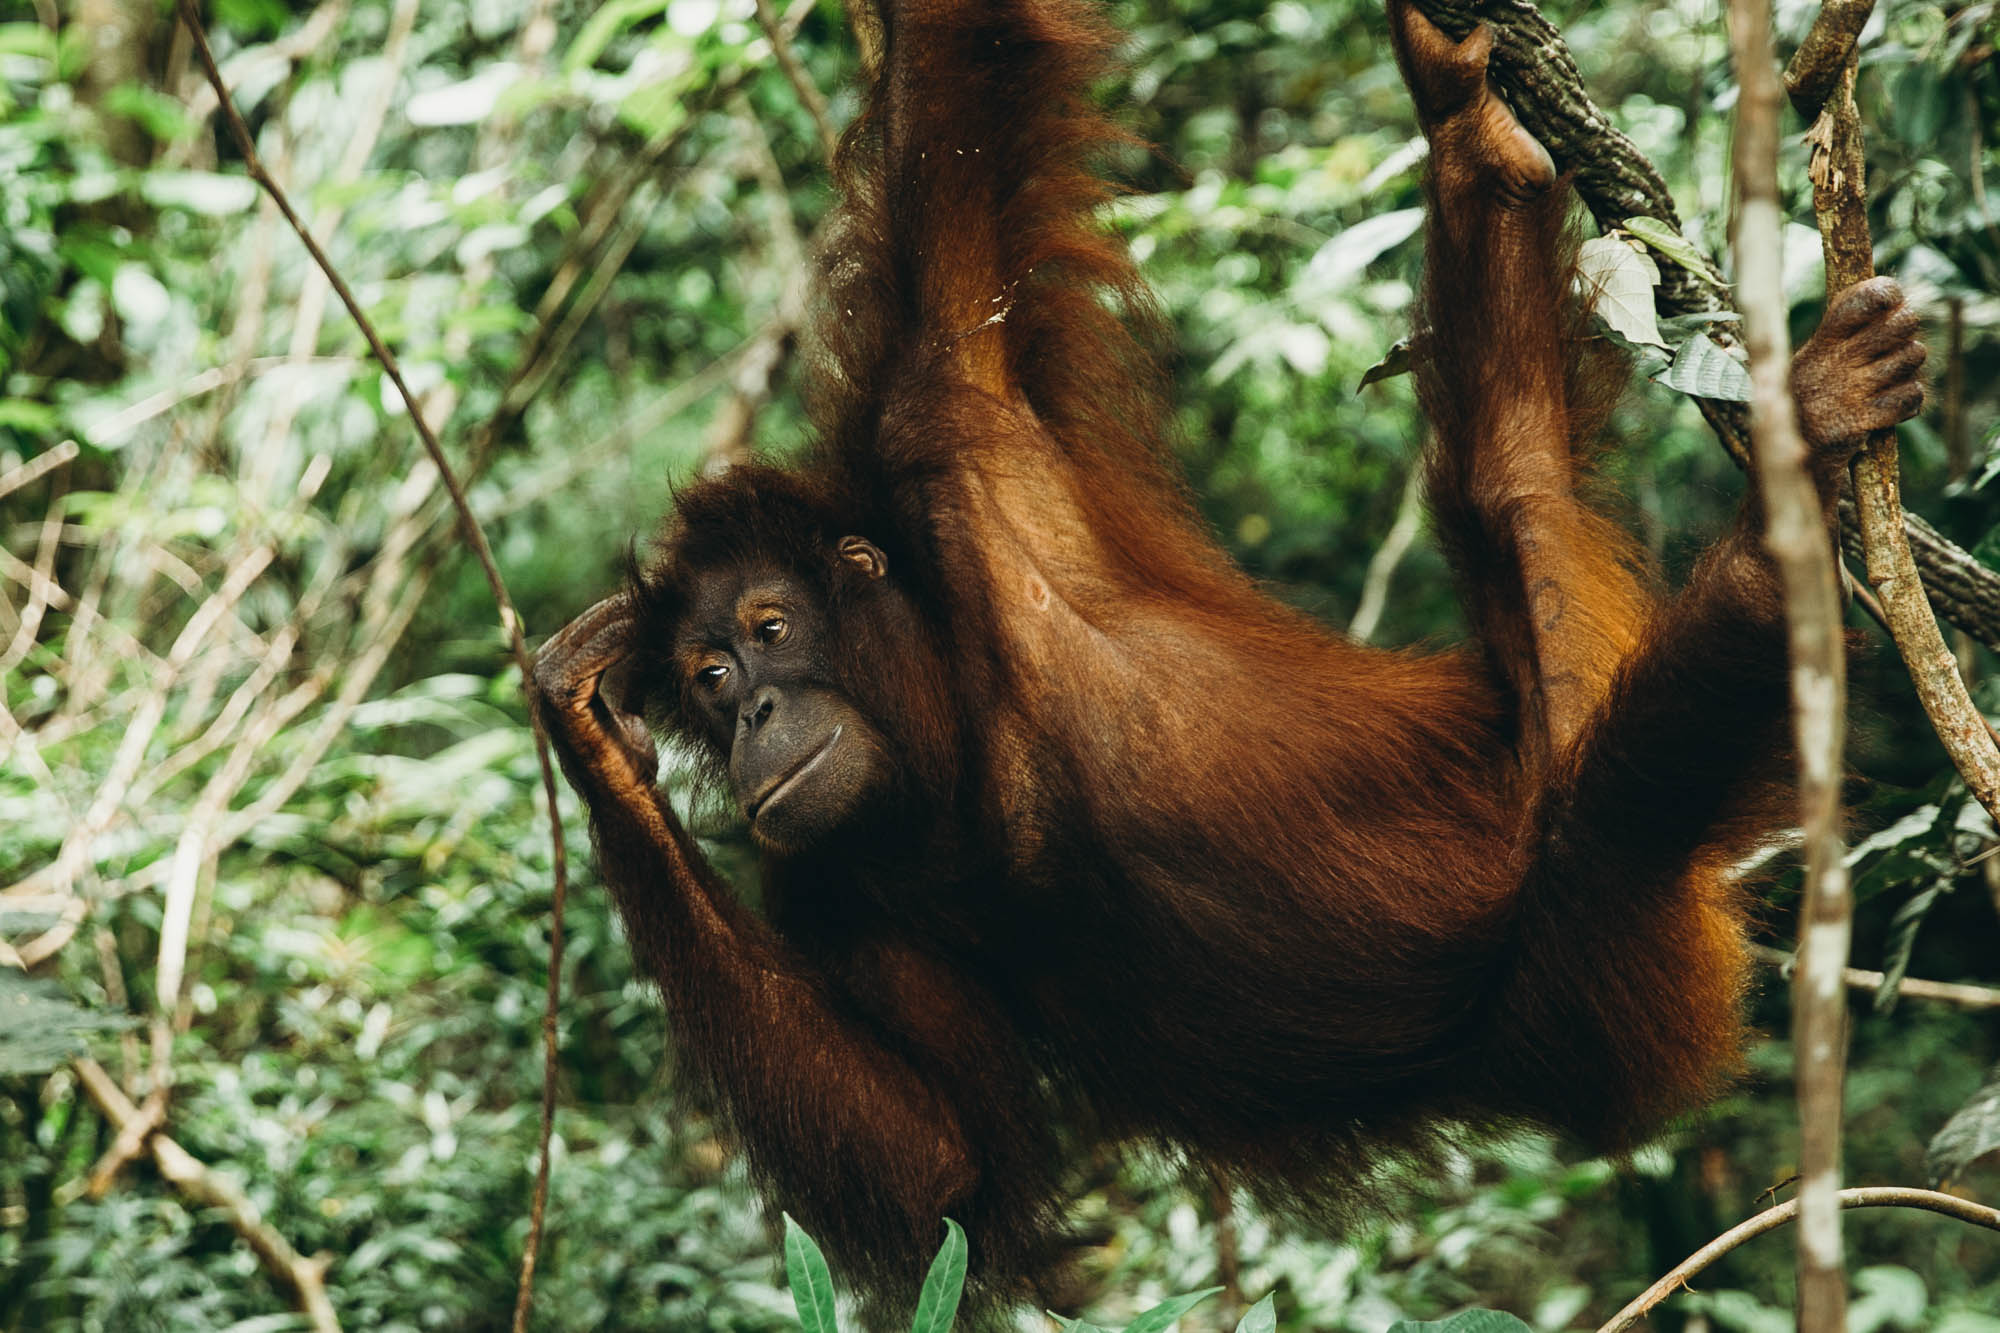 Borneo_HBGOODIE2018 (6 of 6).jpg